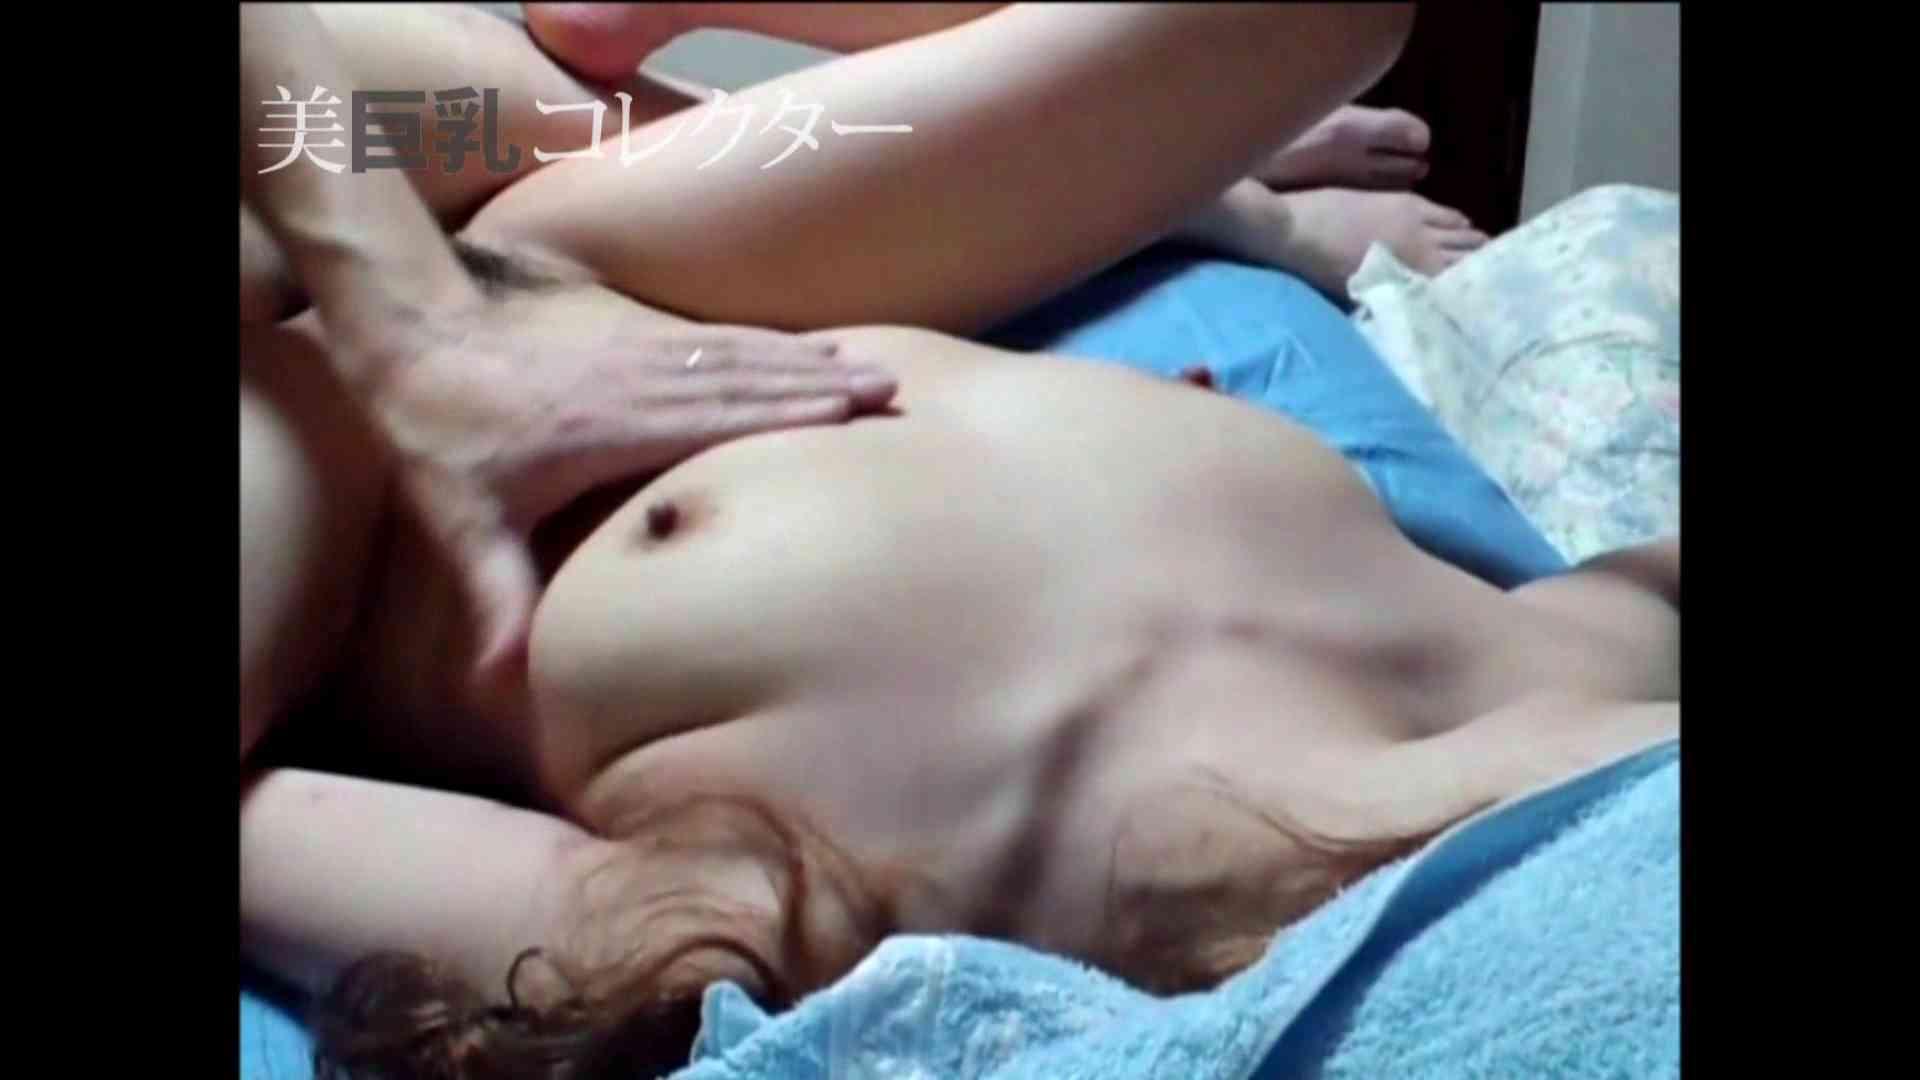 泥酔スレンダー巨乳美女2 巨乳女子 盗撮動画紹介 109pic 20